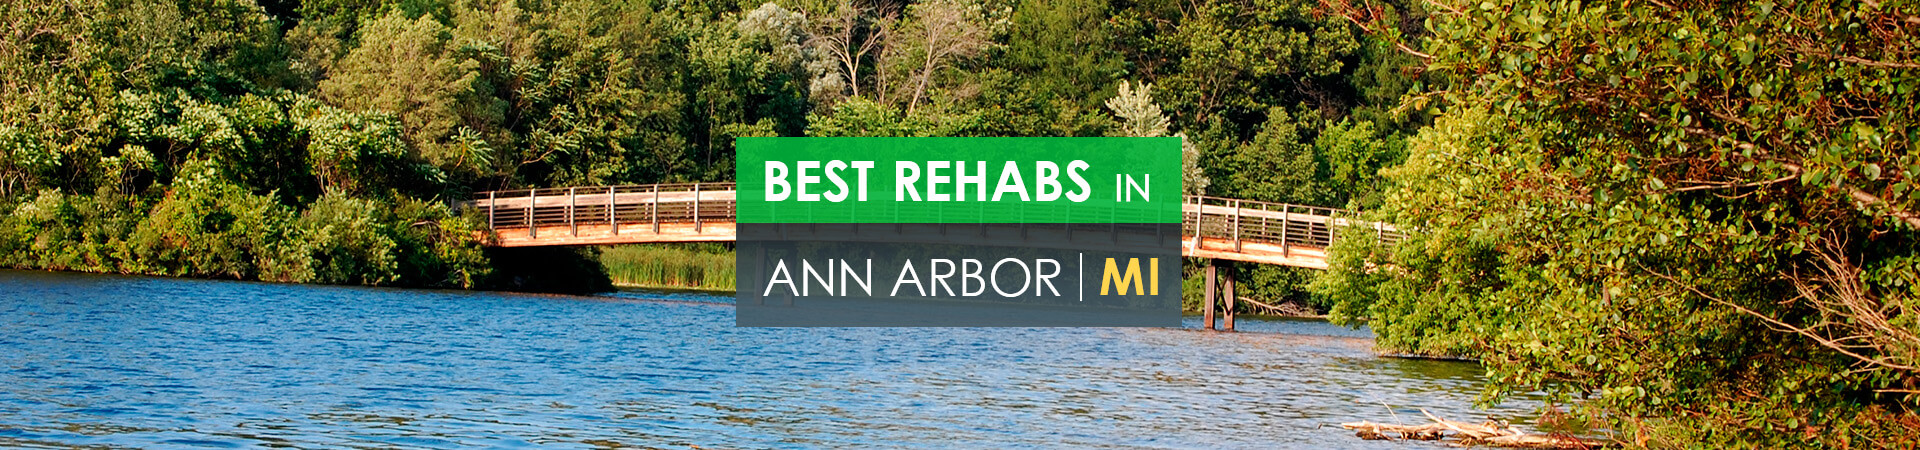 Best rehabs in Ann Arbor, MI